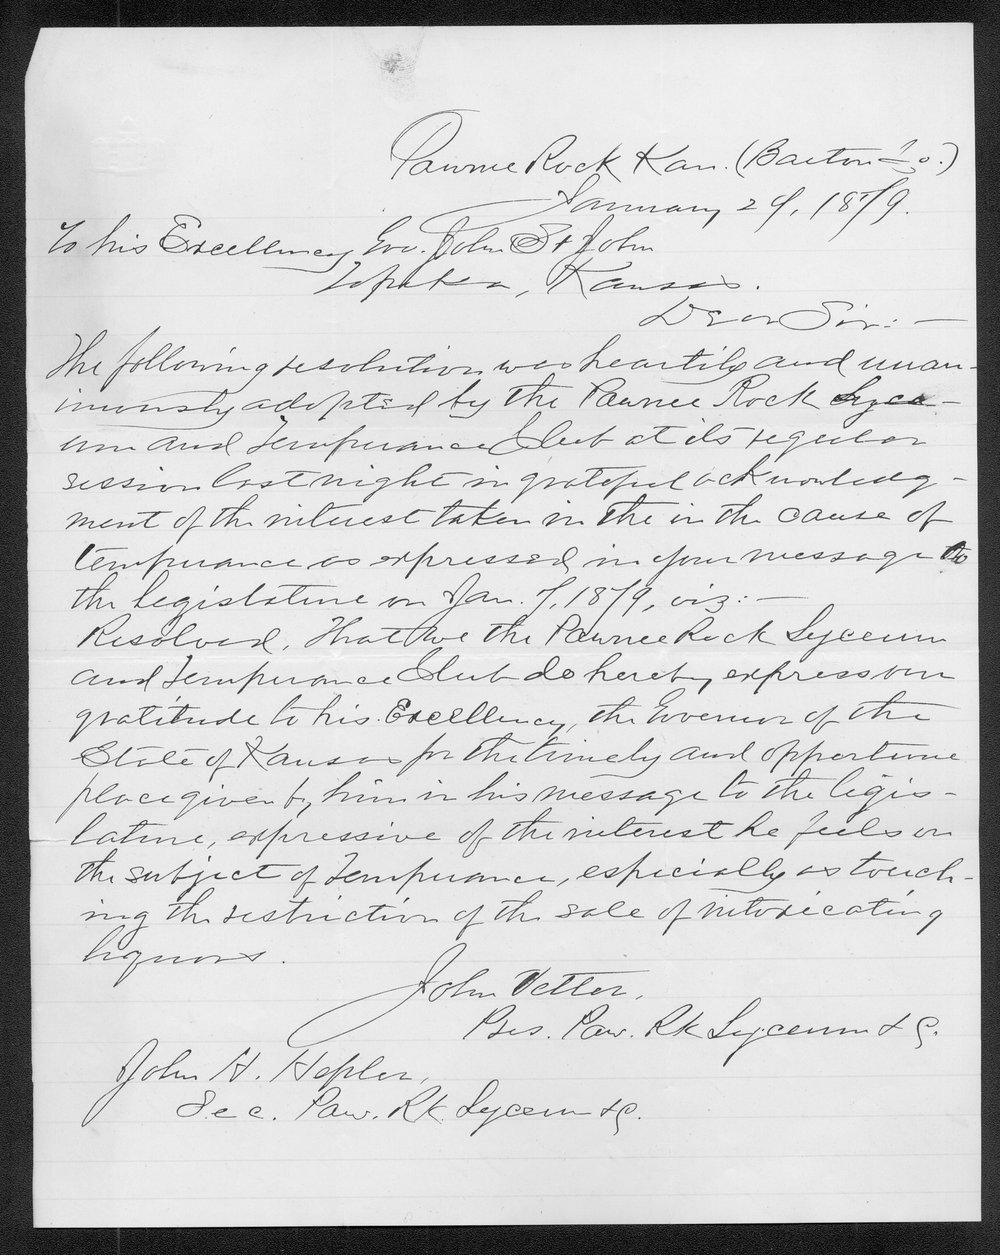 Governor John St. John prohibition received correspondence - 9